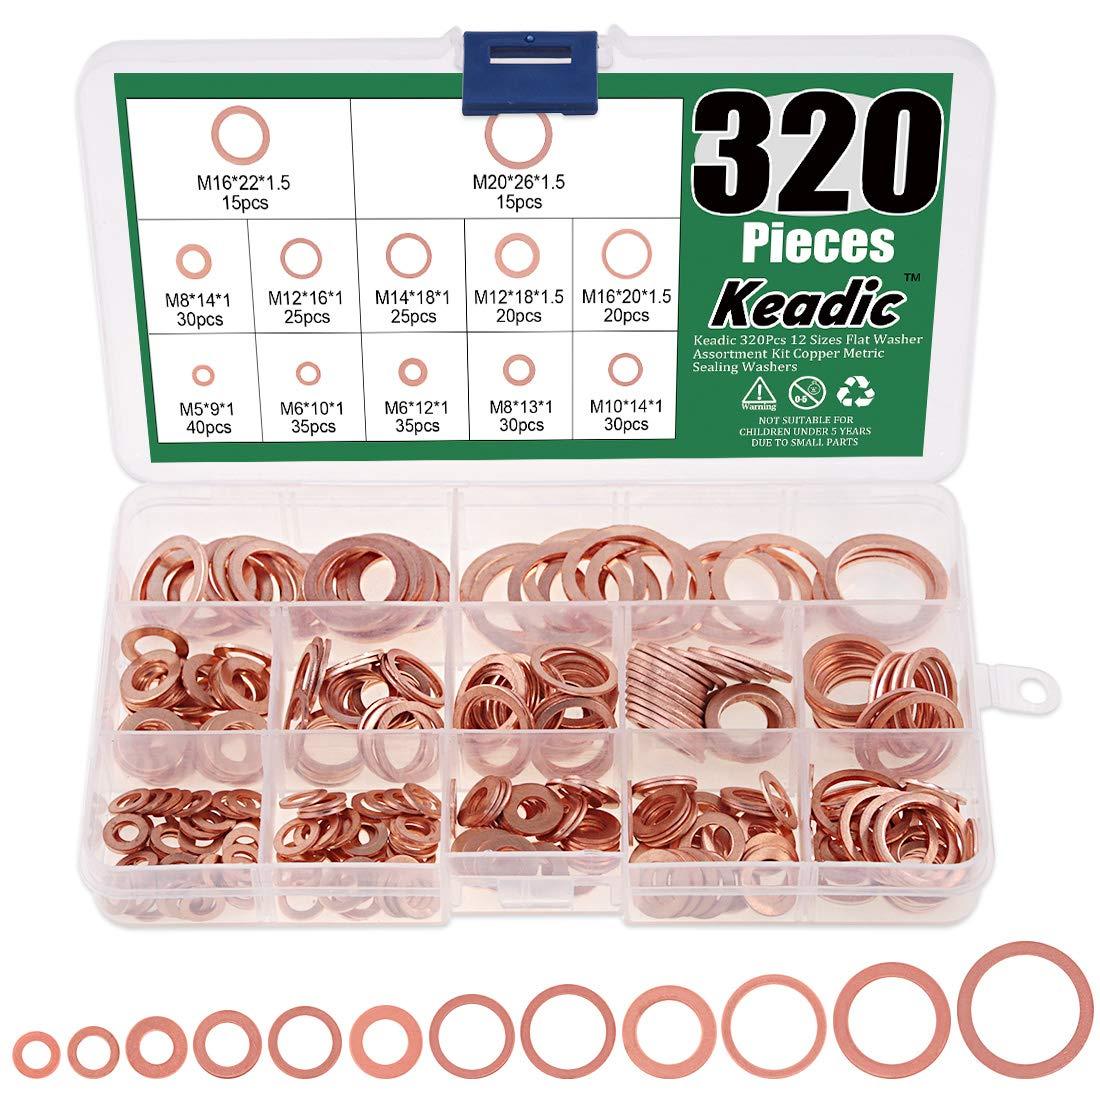 Keadic 320Pcs 12 Sizes Flat Washer Assortment Kit Copper Metric Sealing Washers - M5 M6 M8 M10 M12 M14 M16 M20